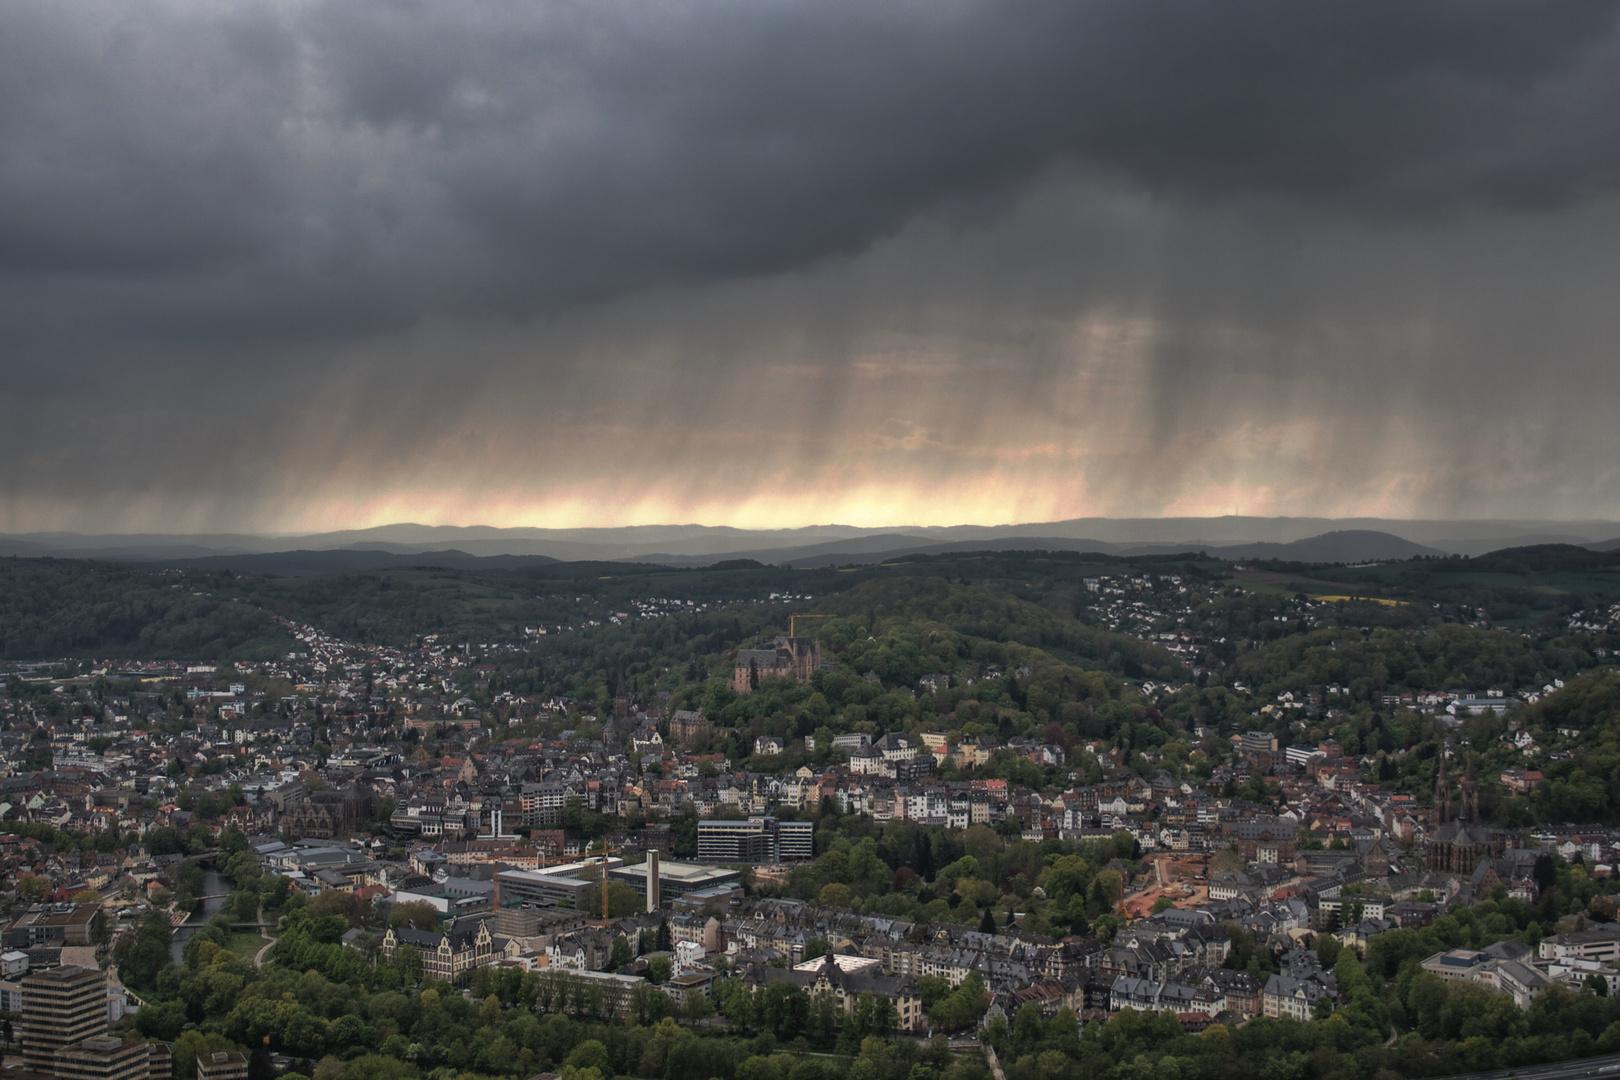 Rain over Marburg